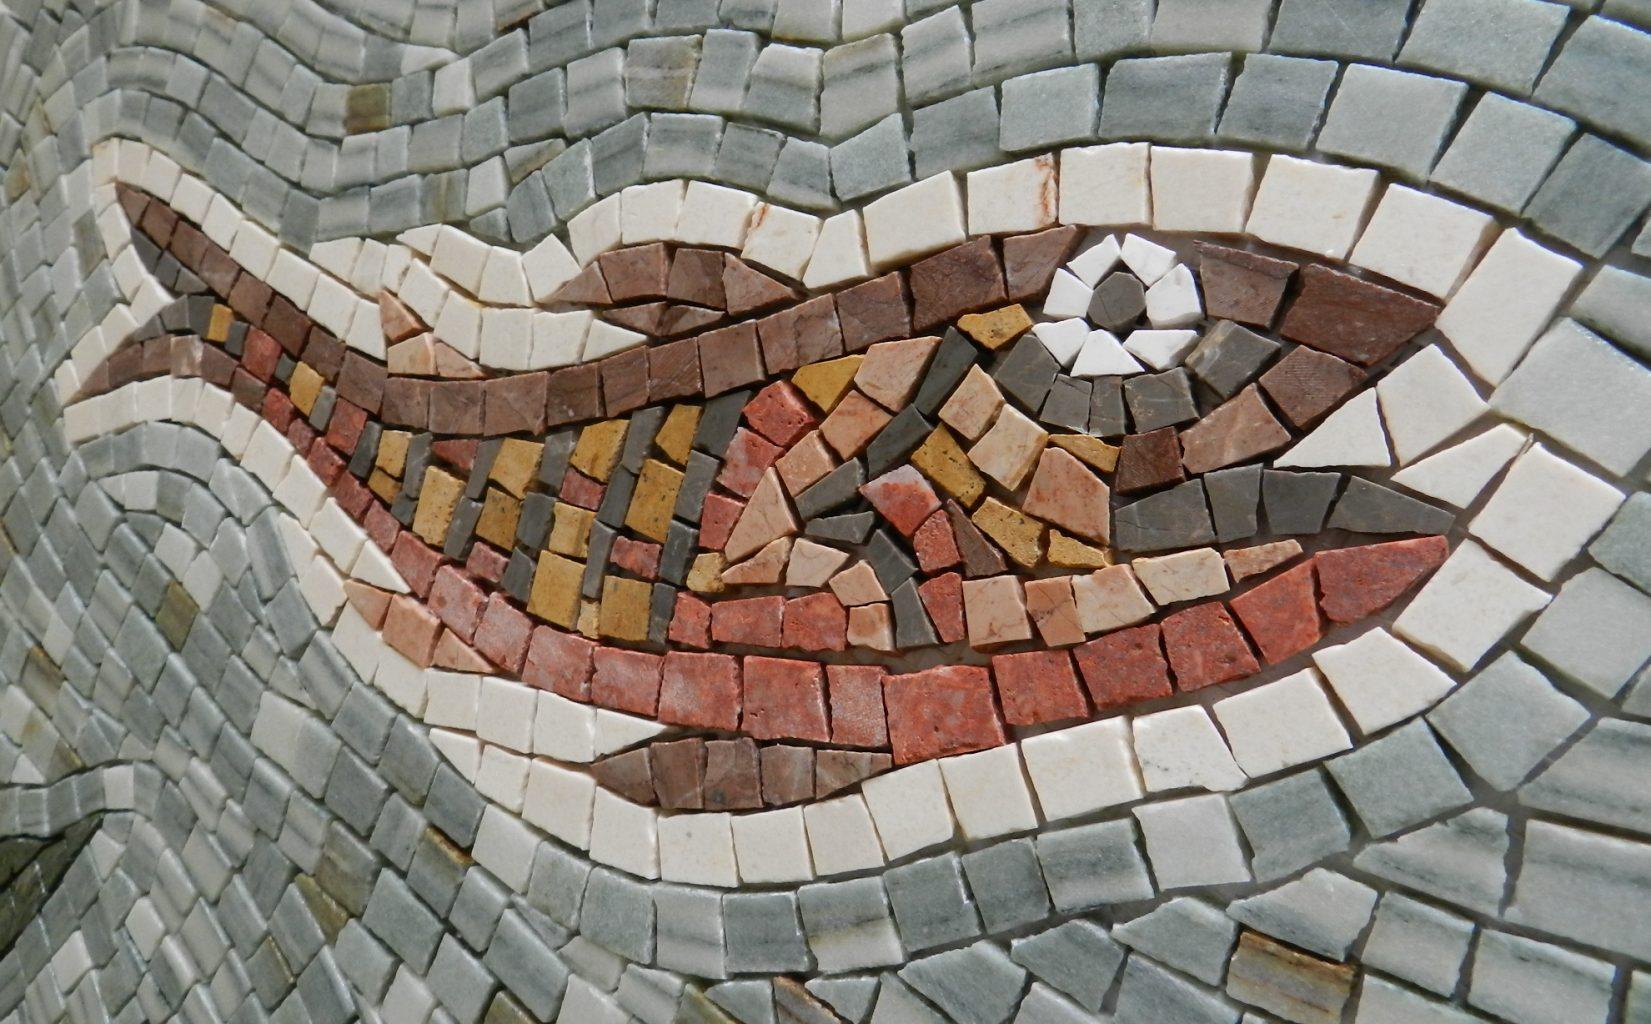 All Cracked Up: Mosaics